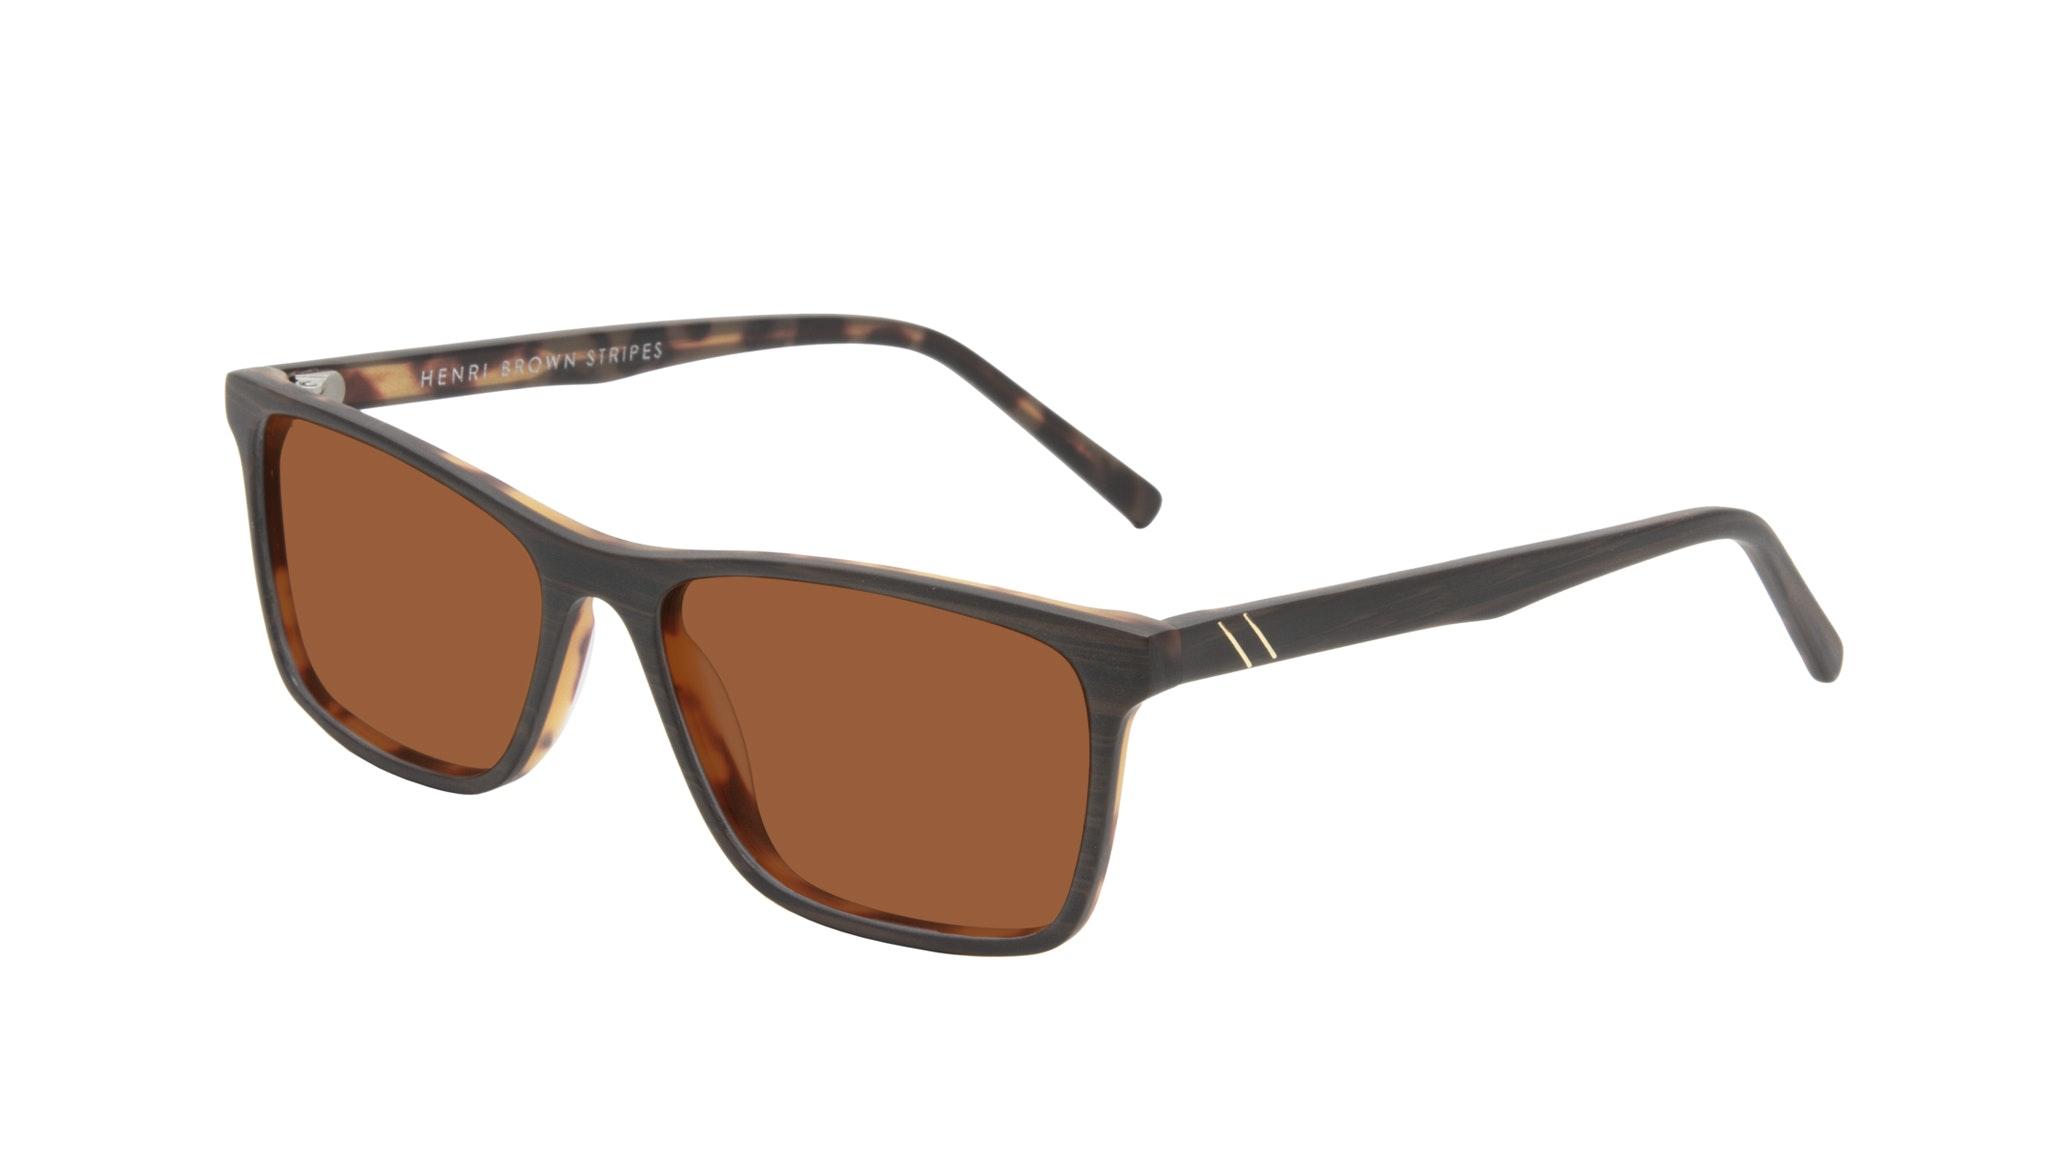 Affordable Fashion Glasses Rectangle Sunglasses Men Henri Brown Stripes Tilt